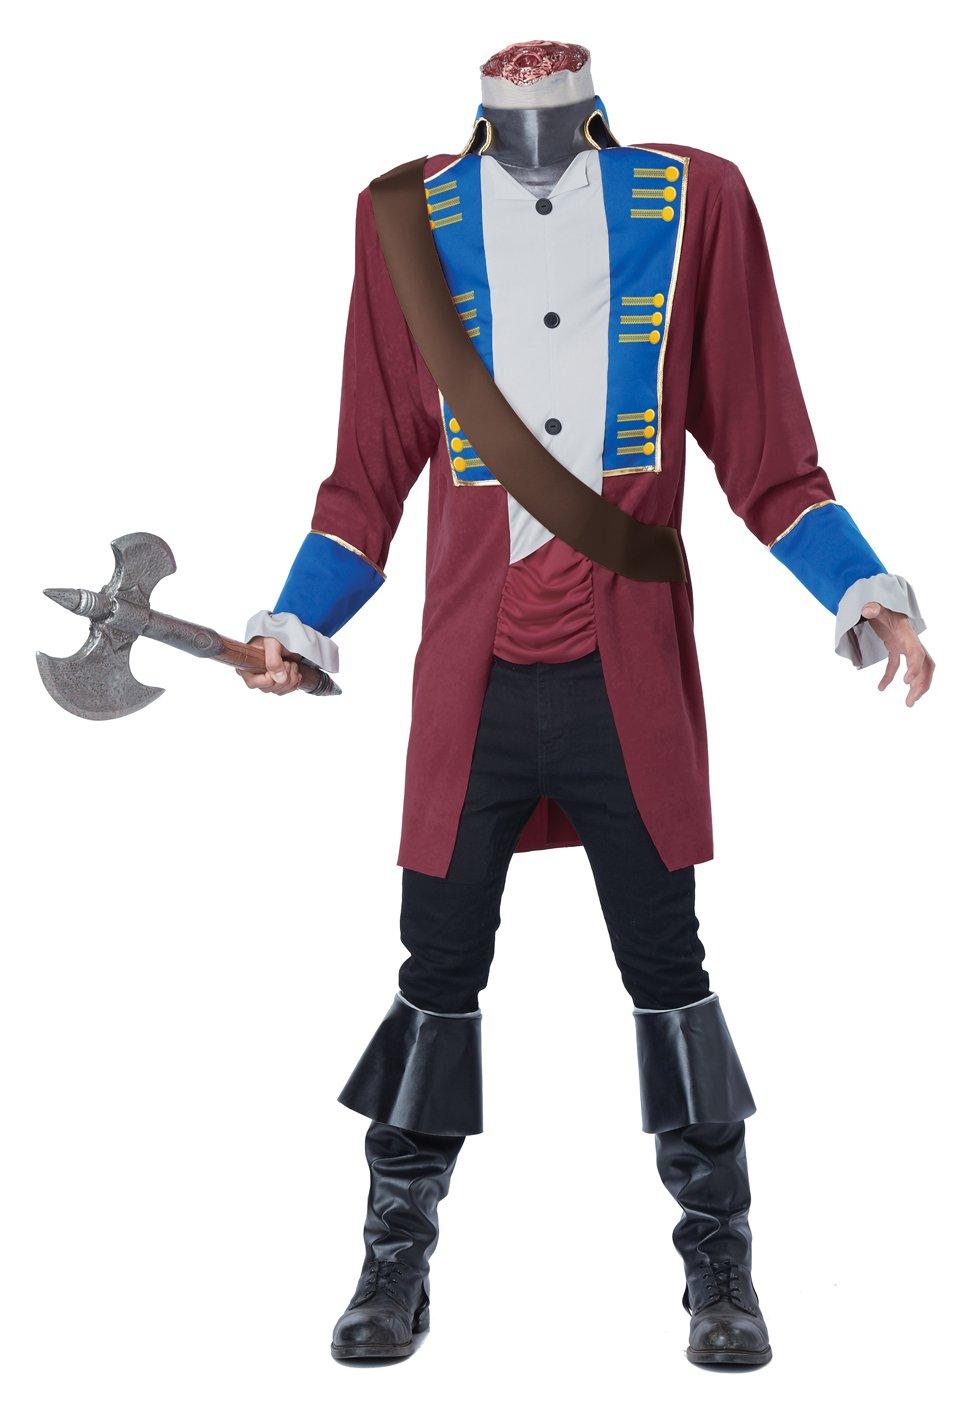 Sleepy Hollow Headless Horseman Adult Costume Size: Large #01598